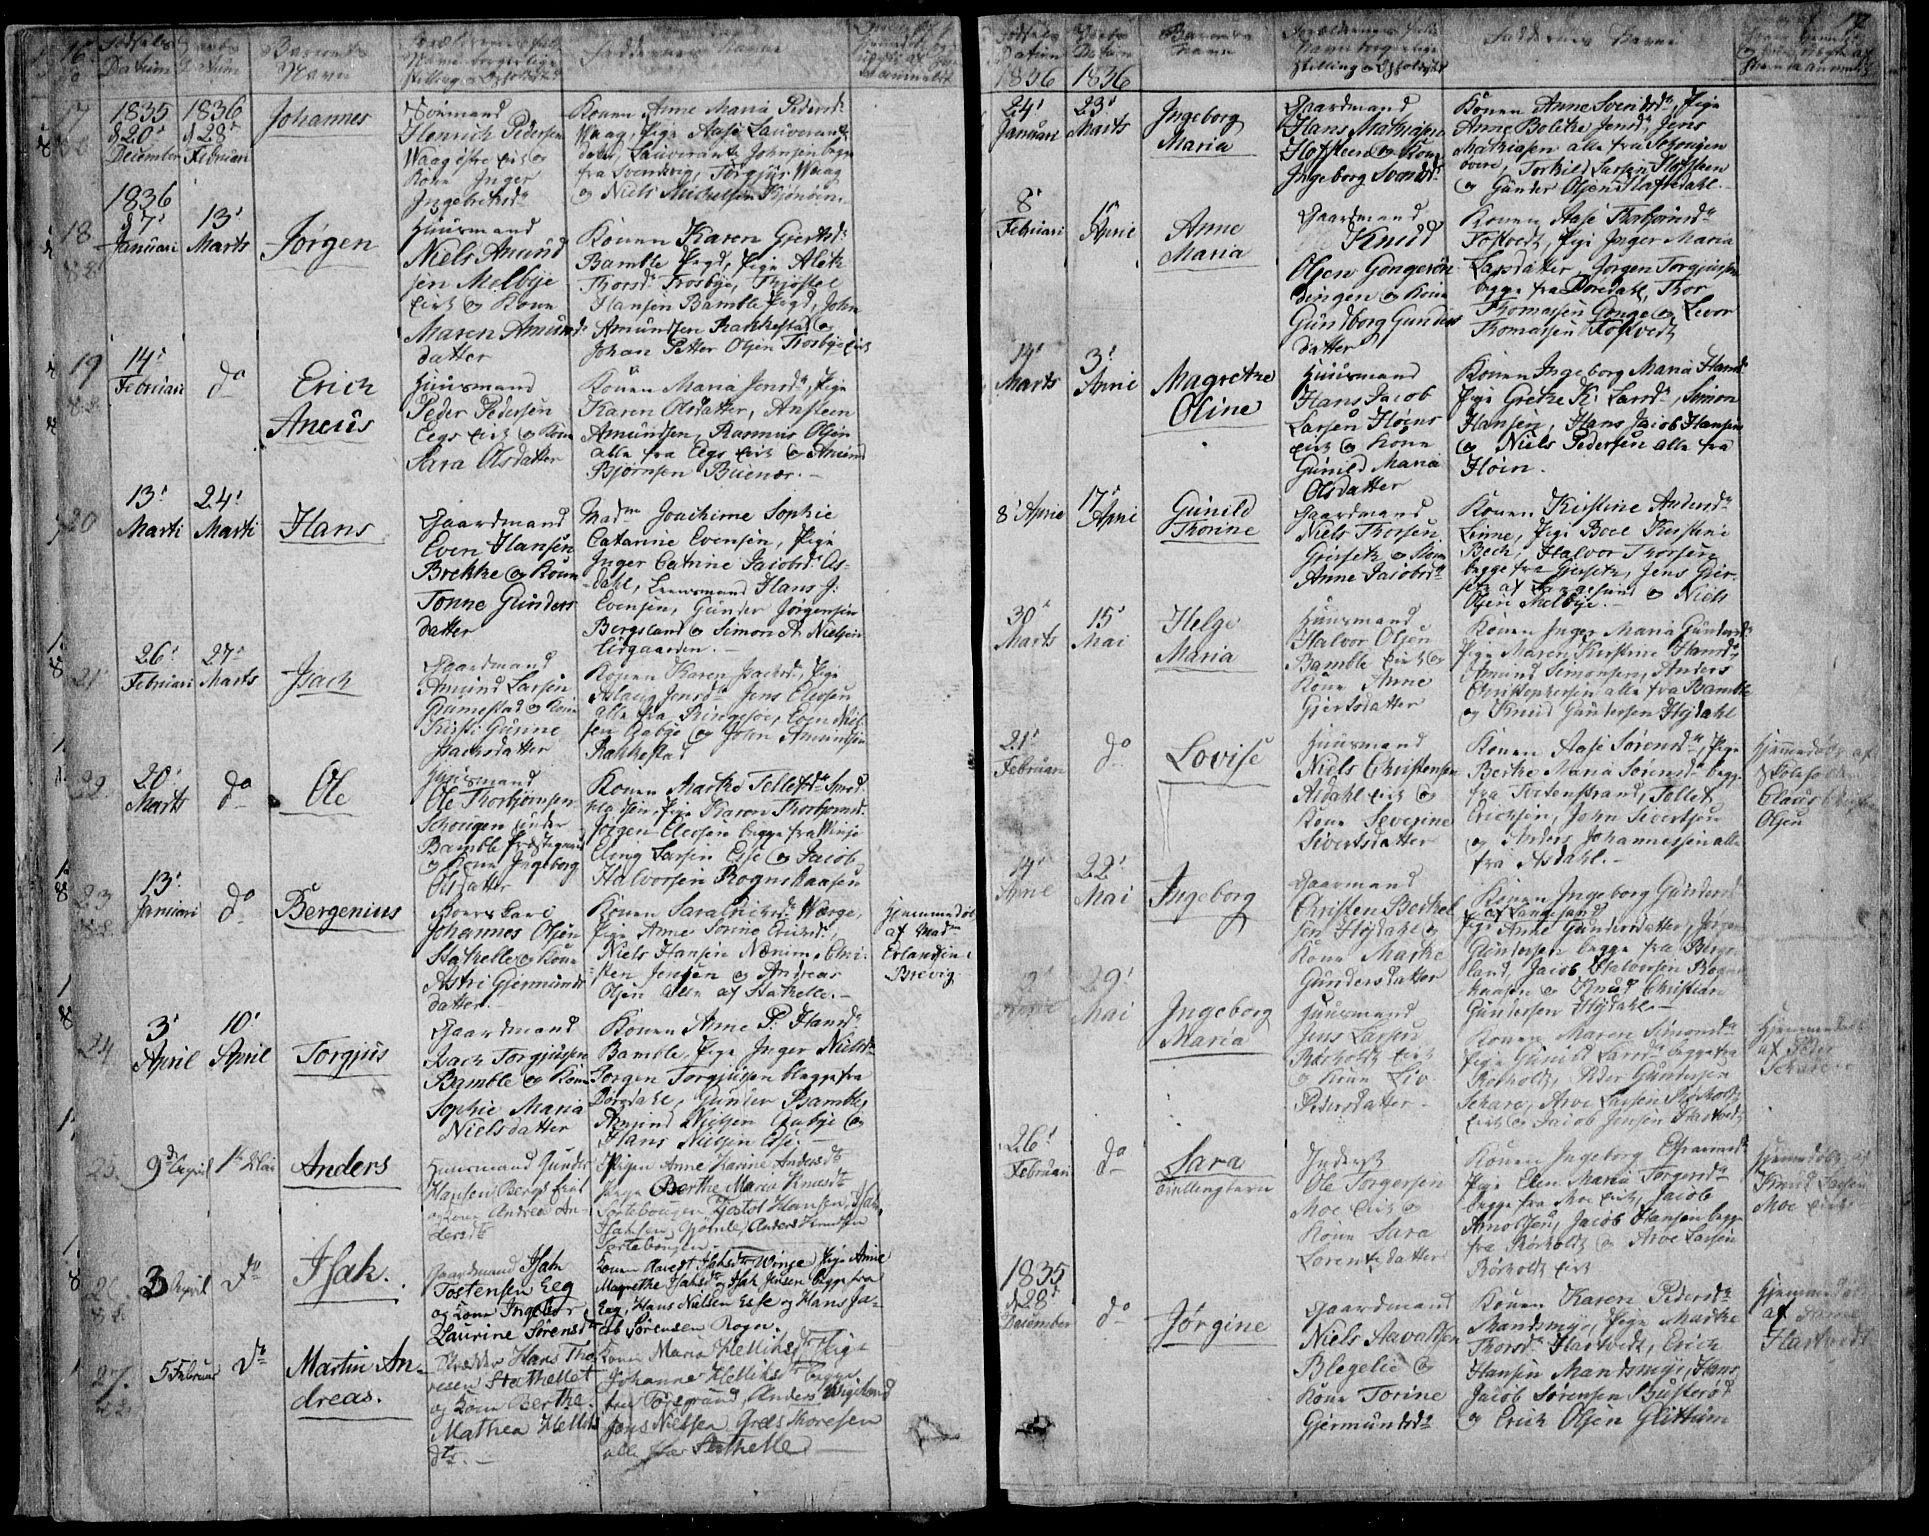 SAKO, Bamble kirkebøker, F/Fa/L0004: Ministerialbok nr. I 4, 1834-1853, s. 16-17